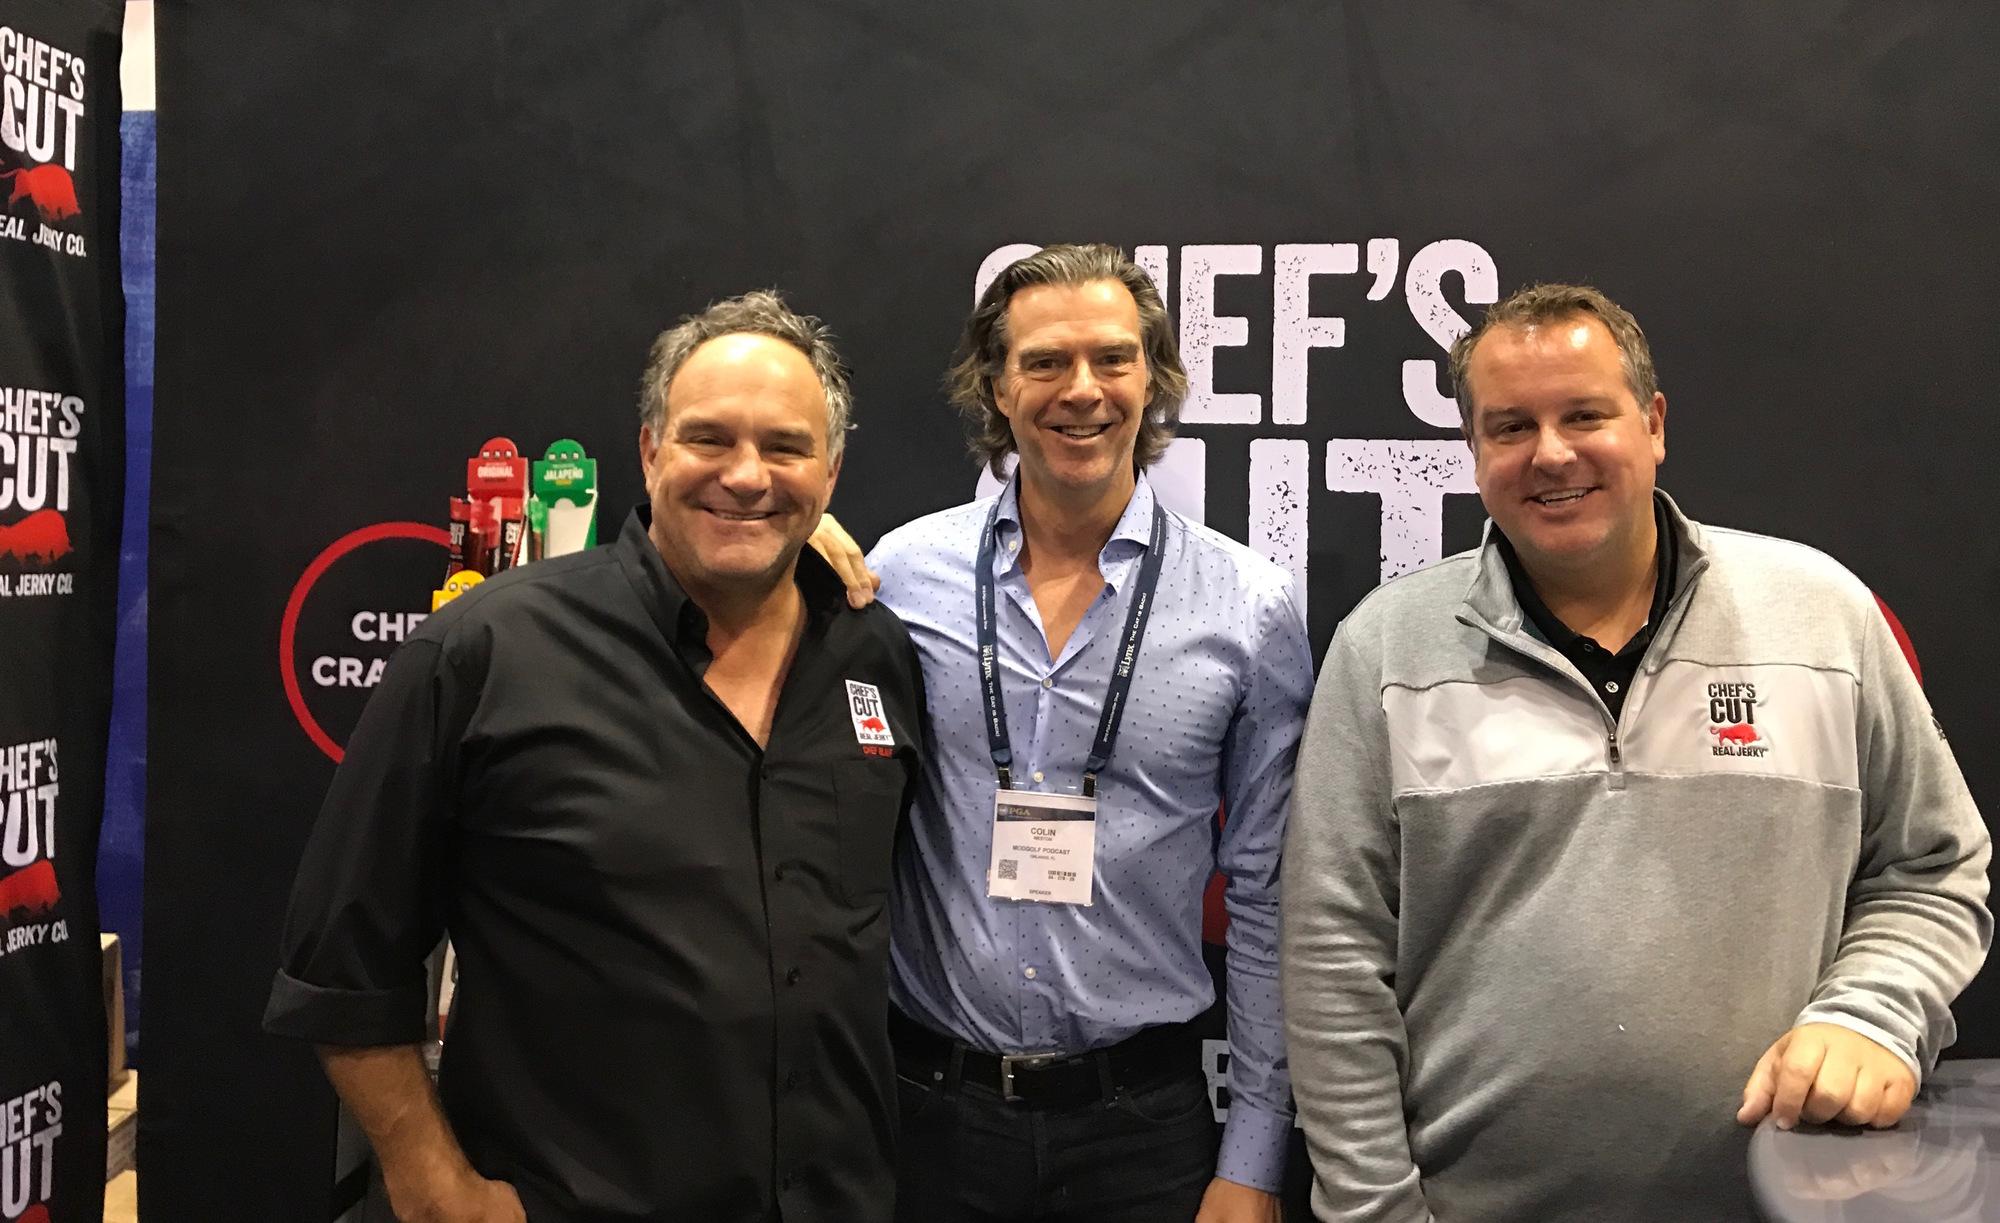 Chefs Cut PGA Show